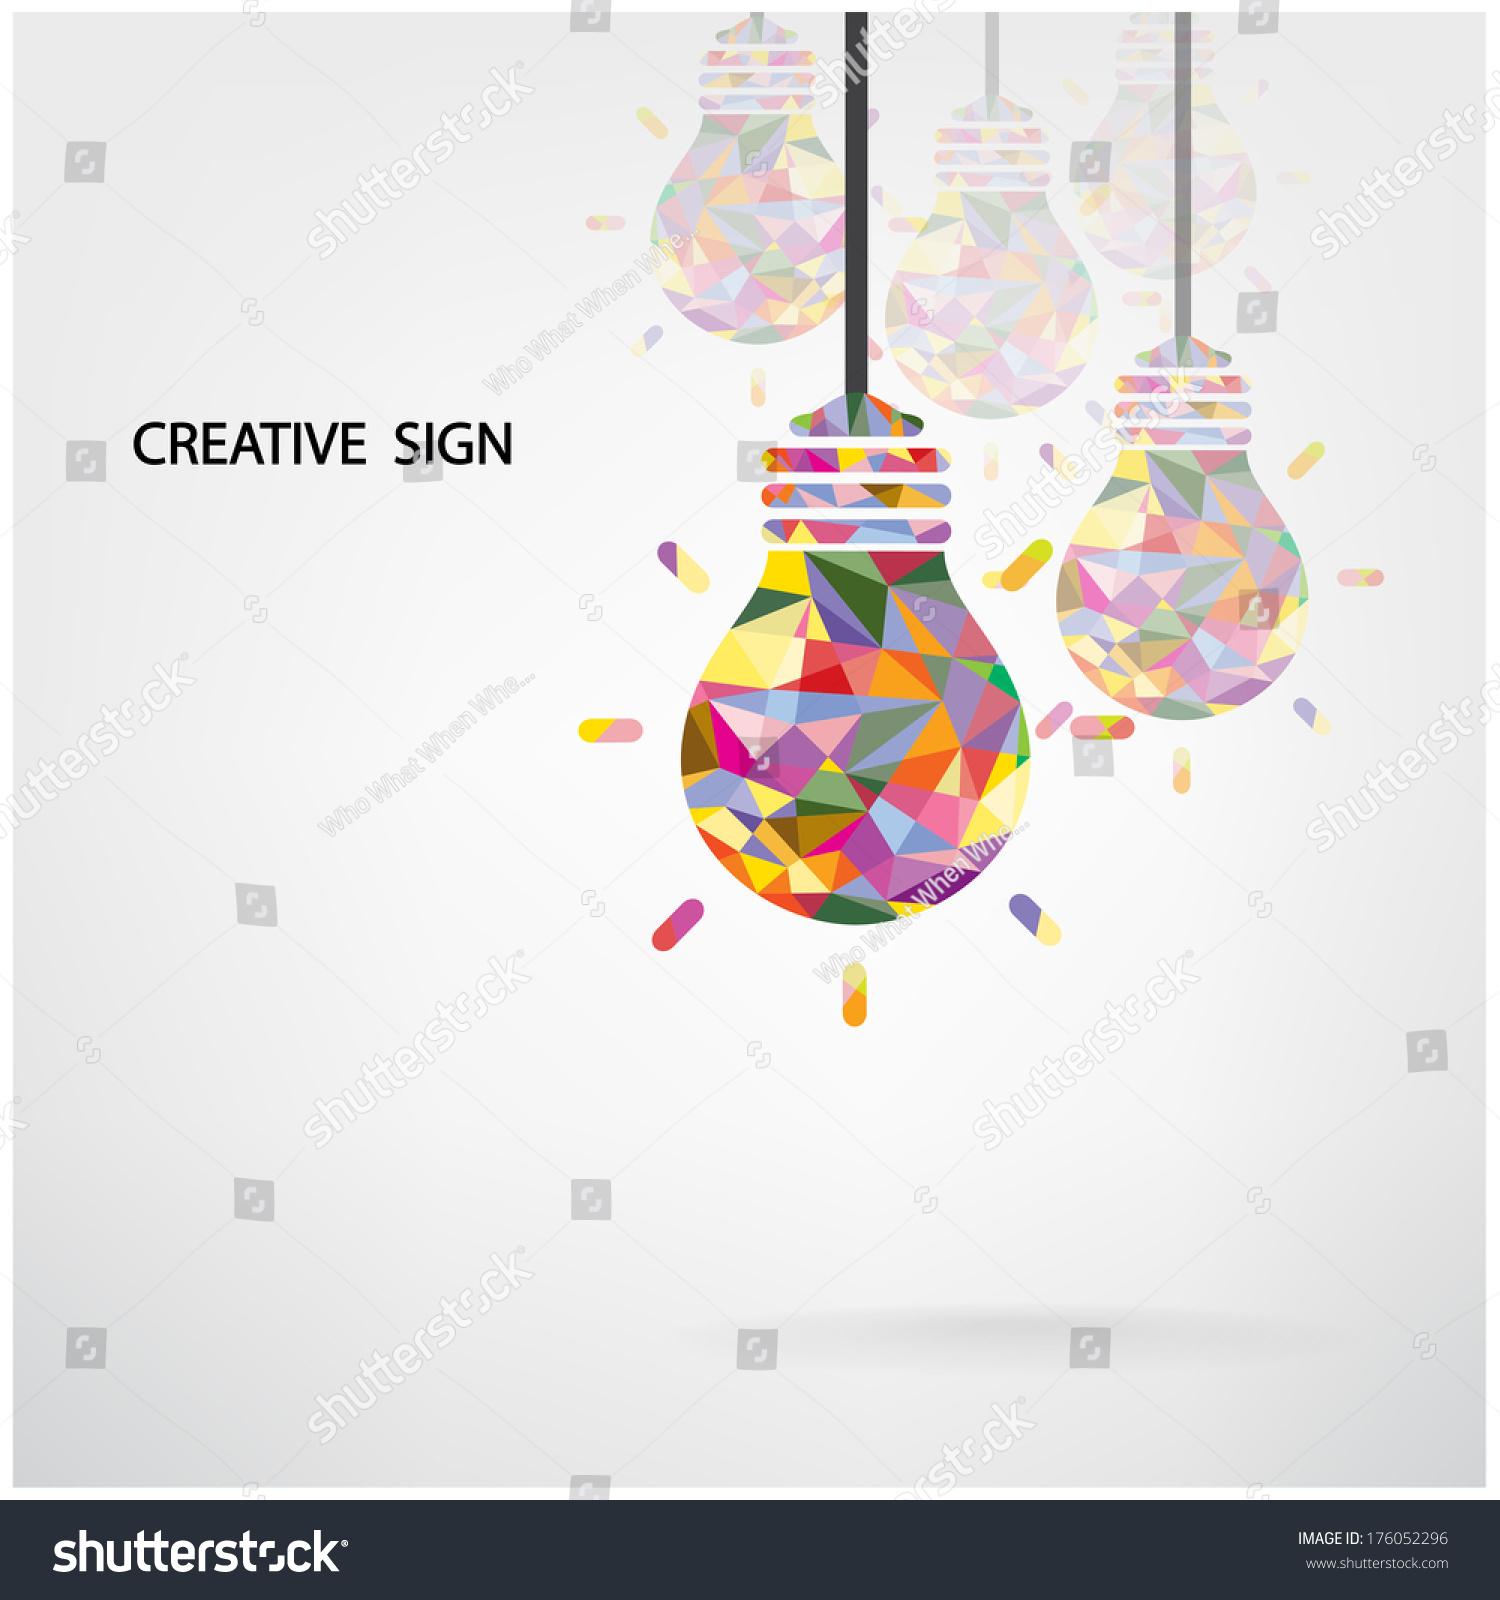 creative light bulb idea concept background design for poster flyer